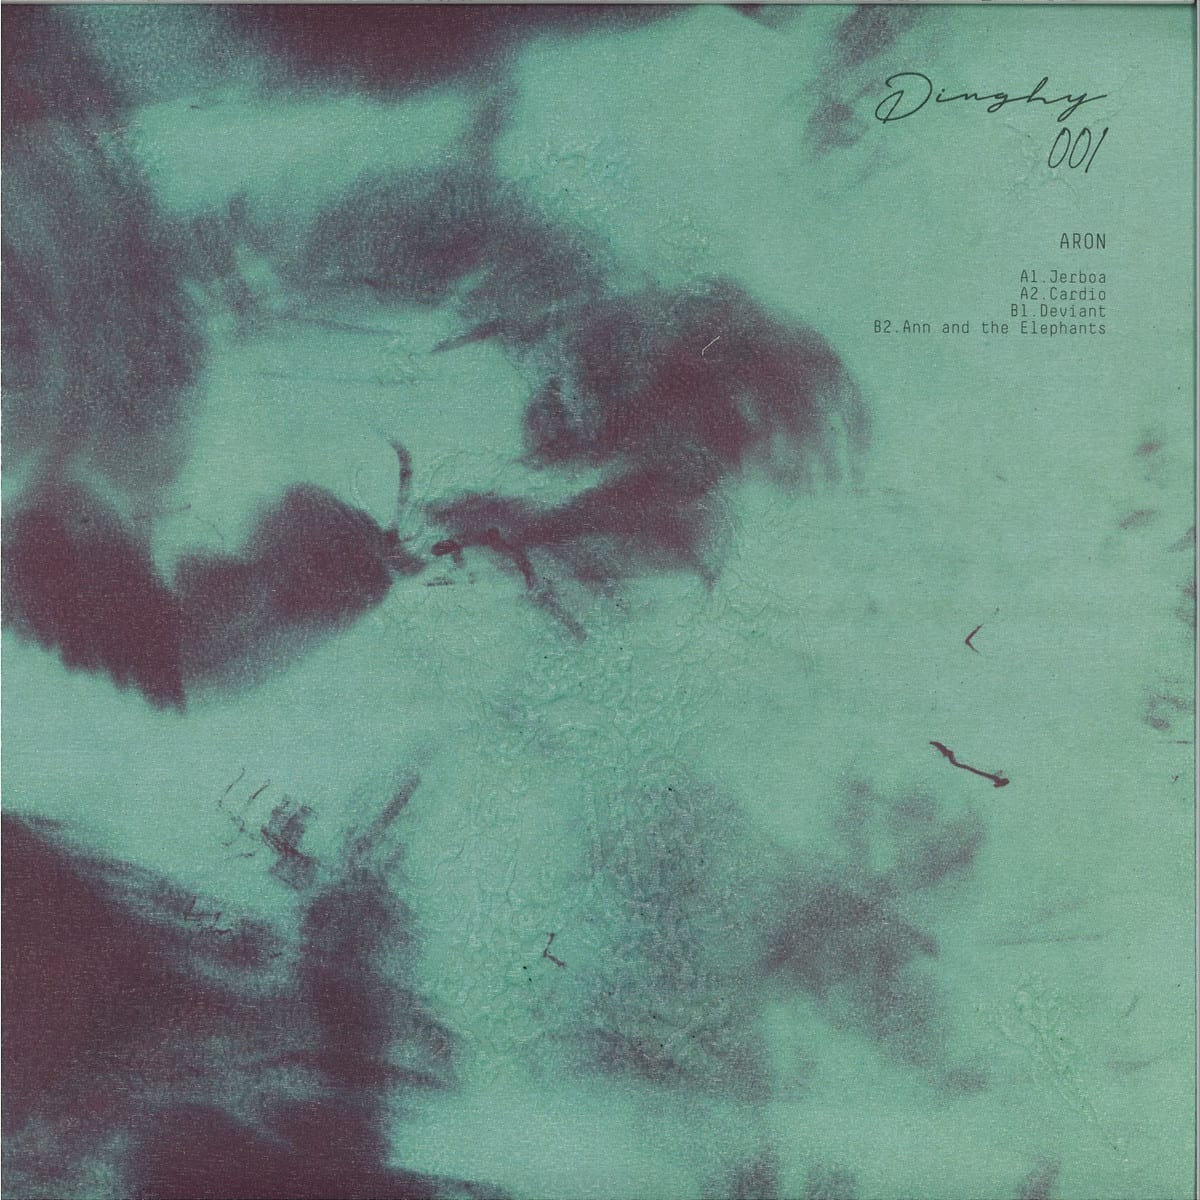 Aron - DINGHY001 [Dinghy] 1